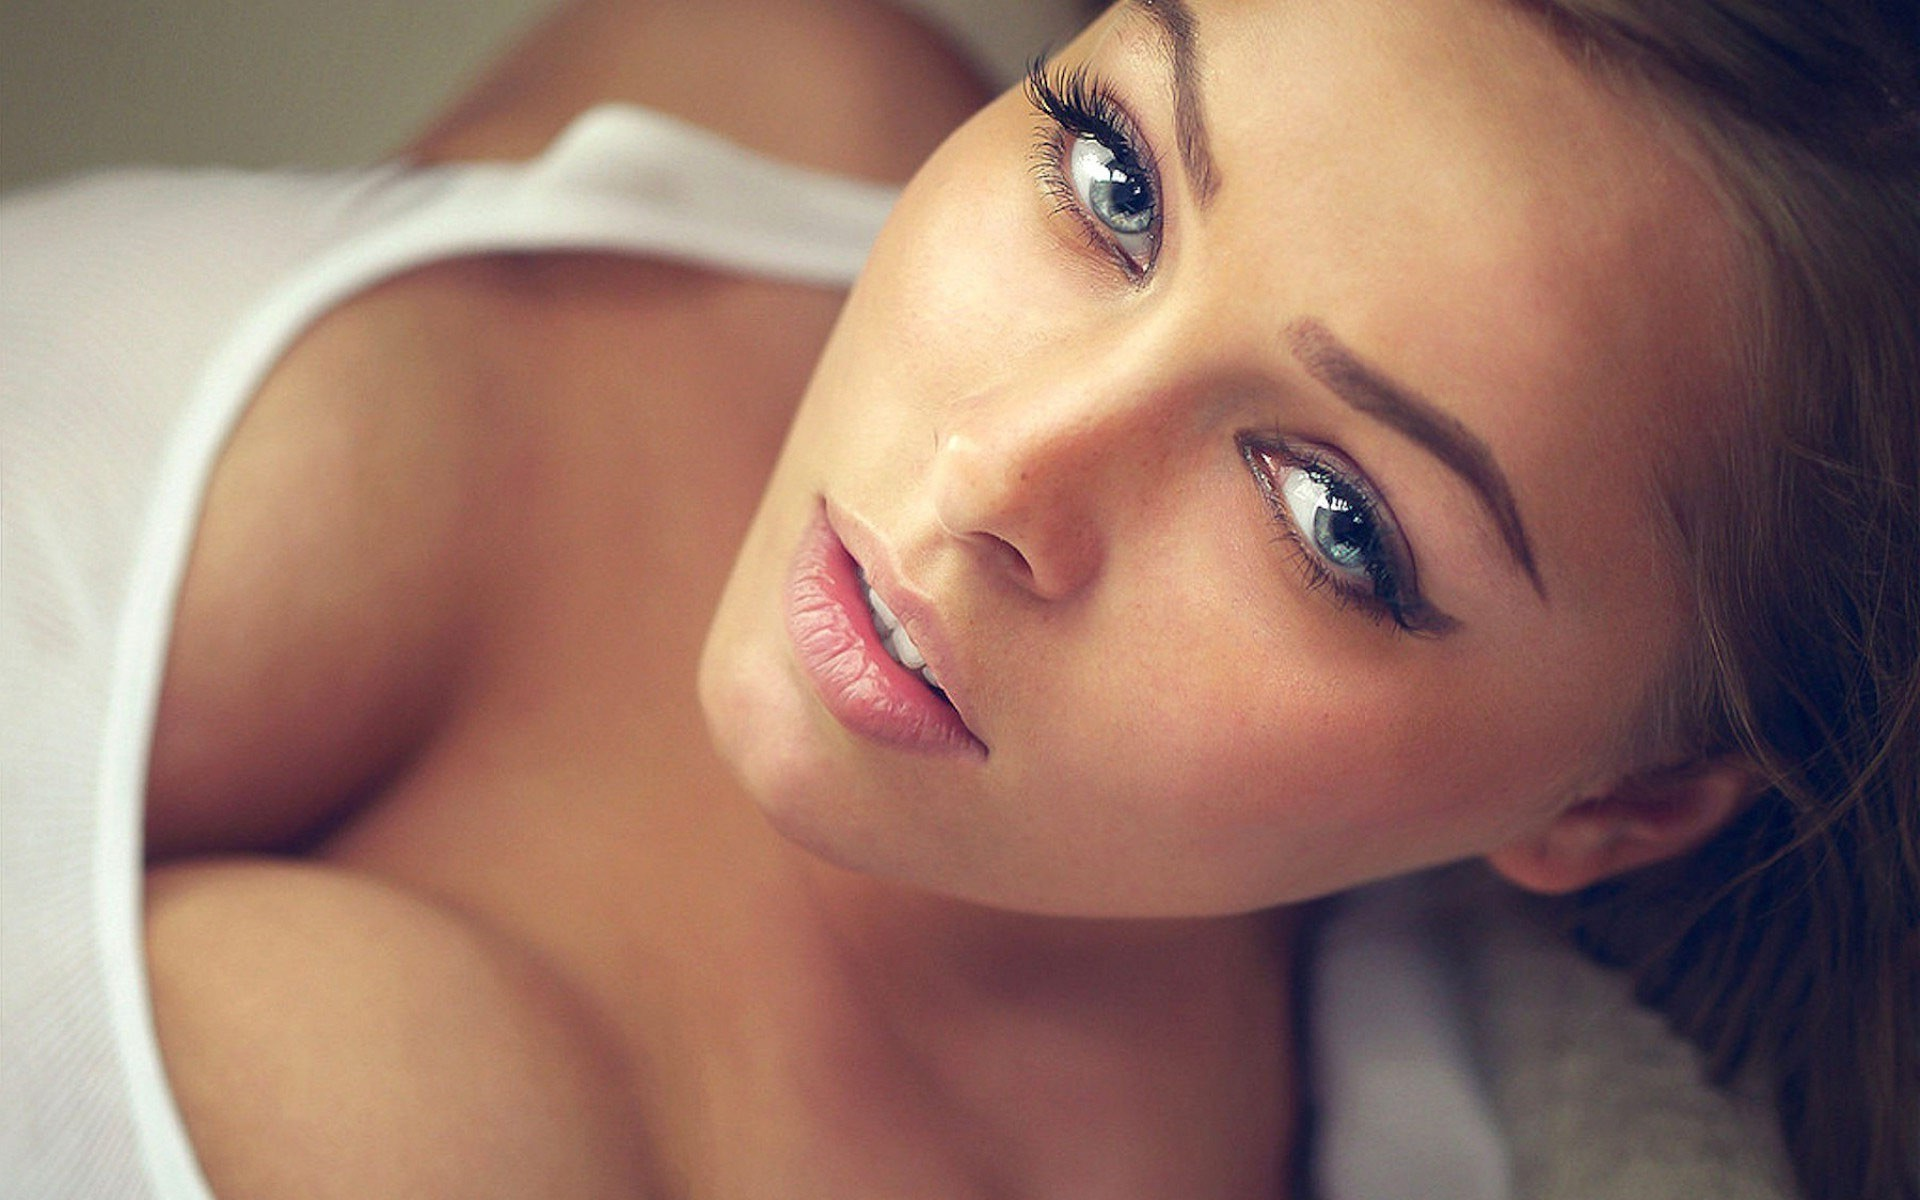 Blue-Eyes-Hot-Girl-HD-wallpaper jpg | 8K Pics